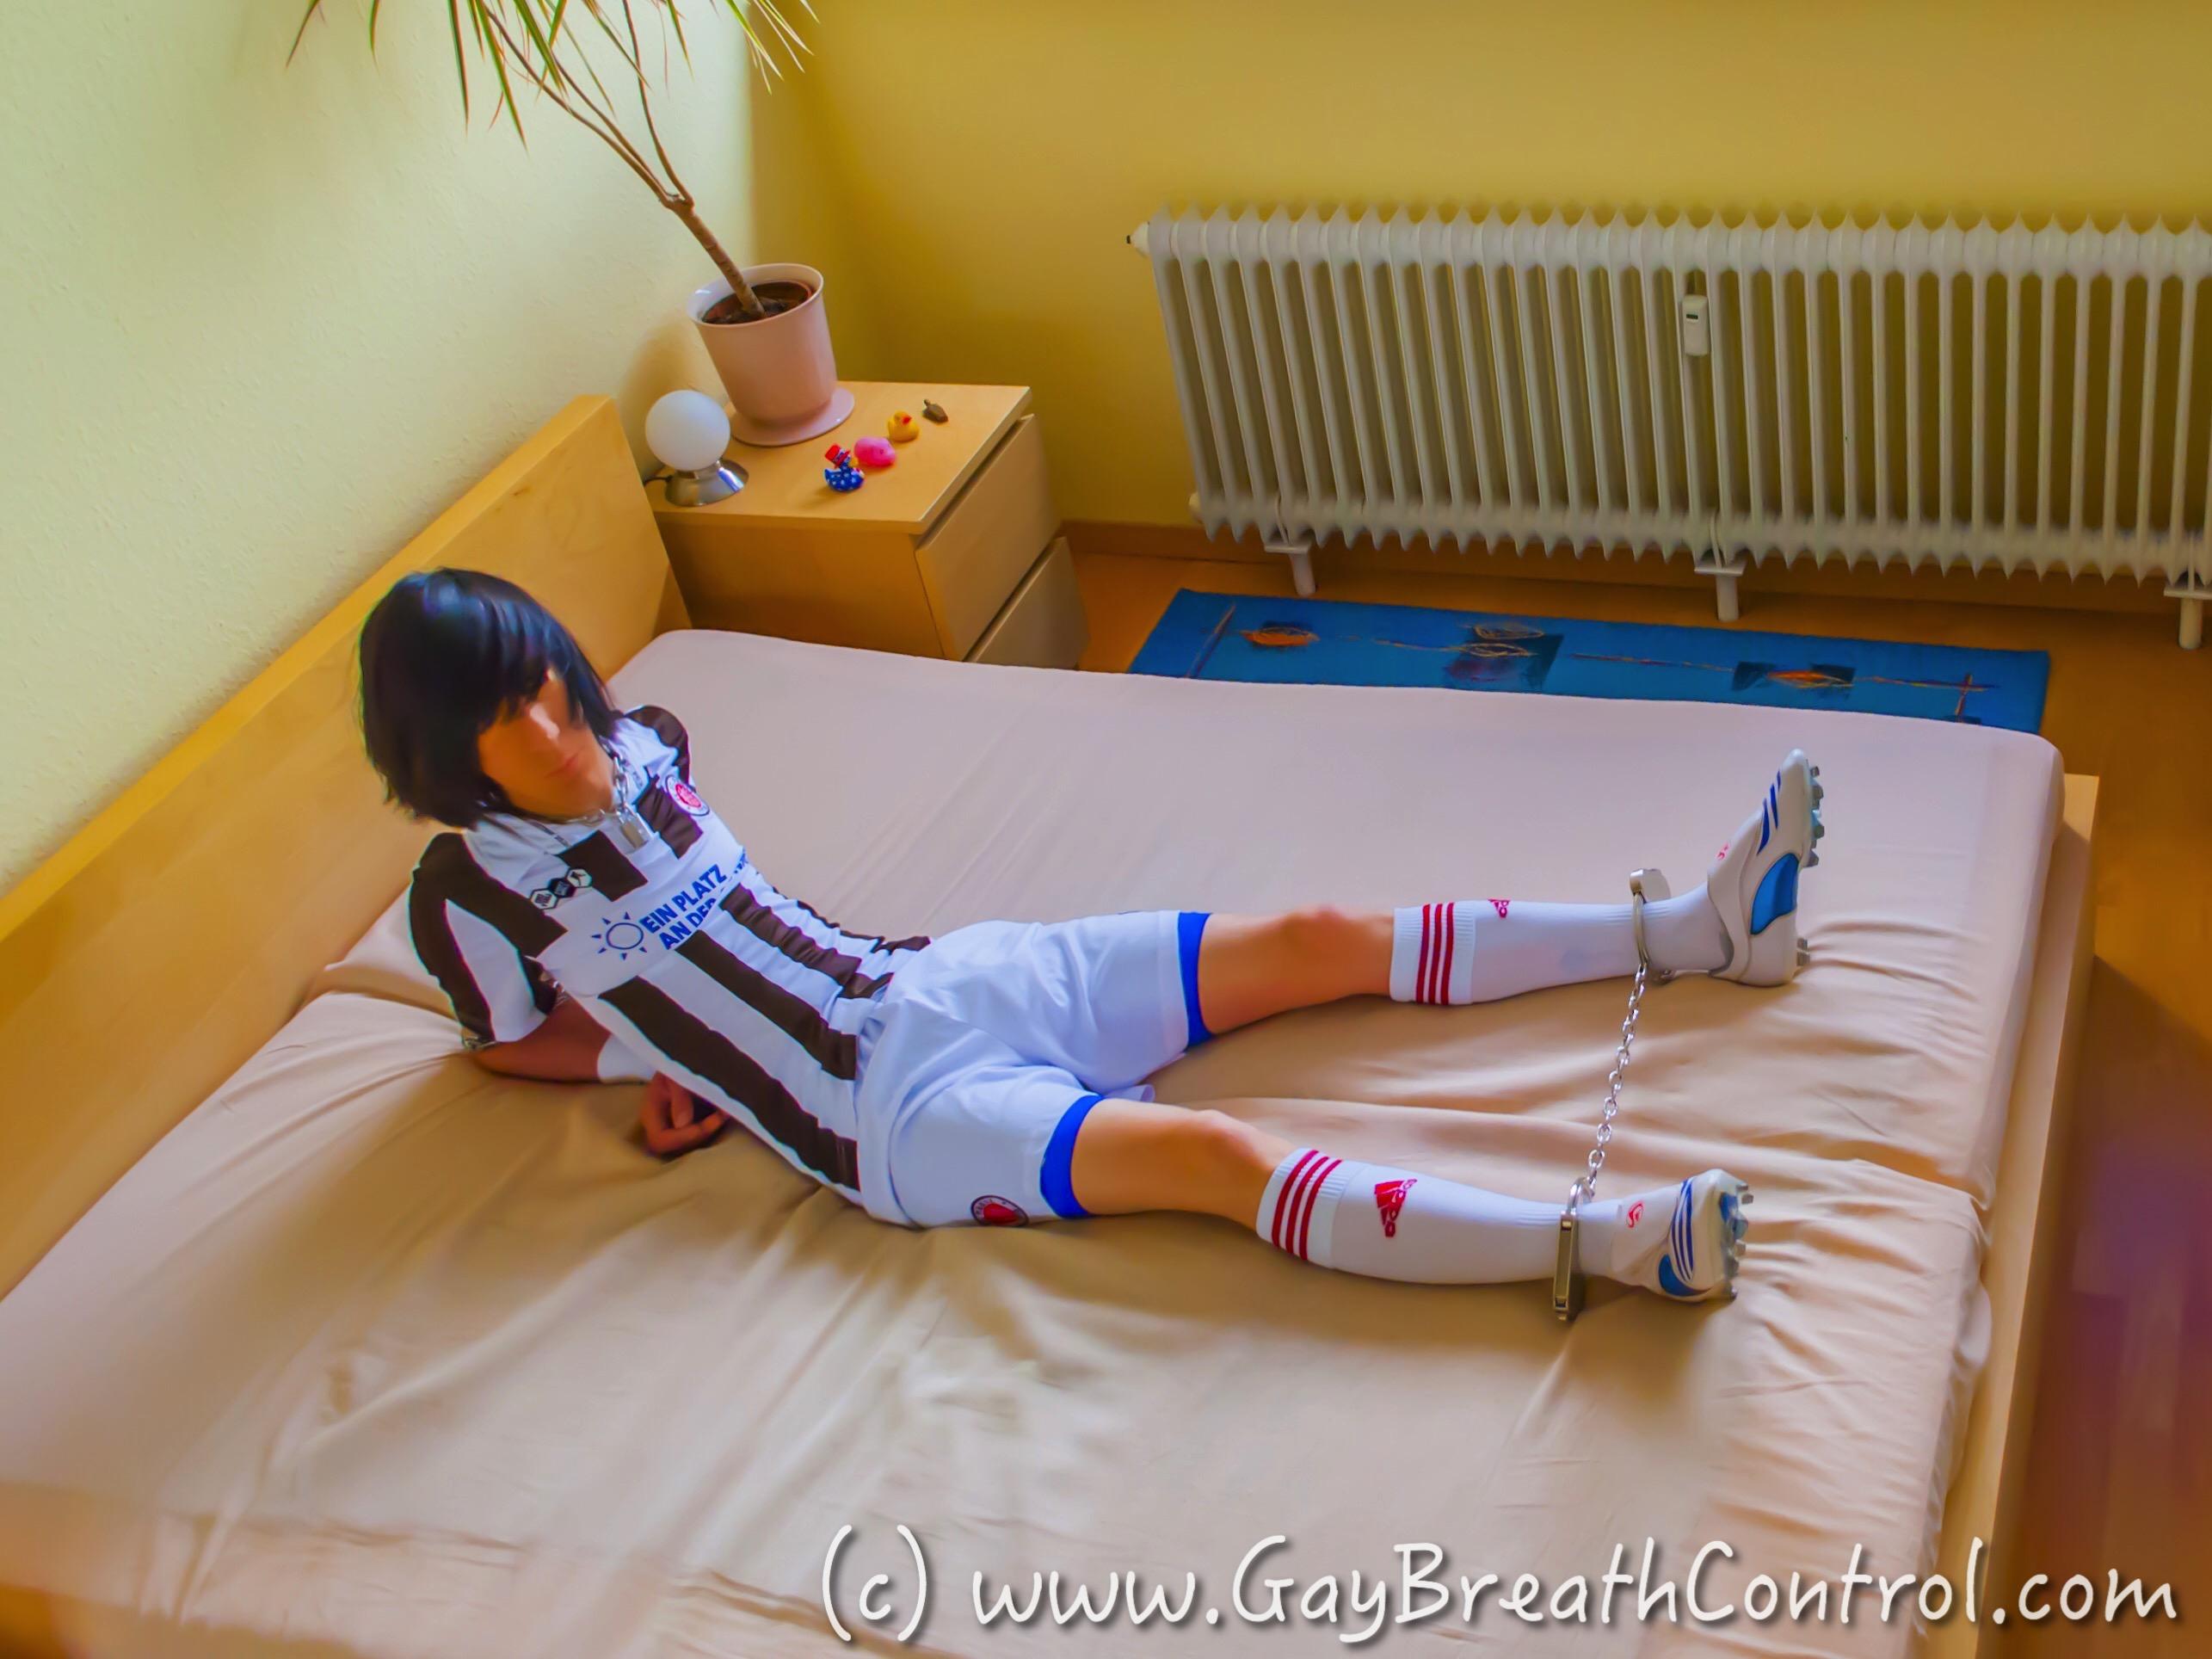 emo boy tied up hot girls wallpaper